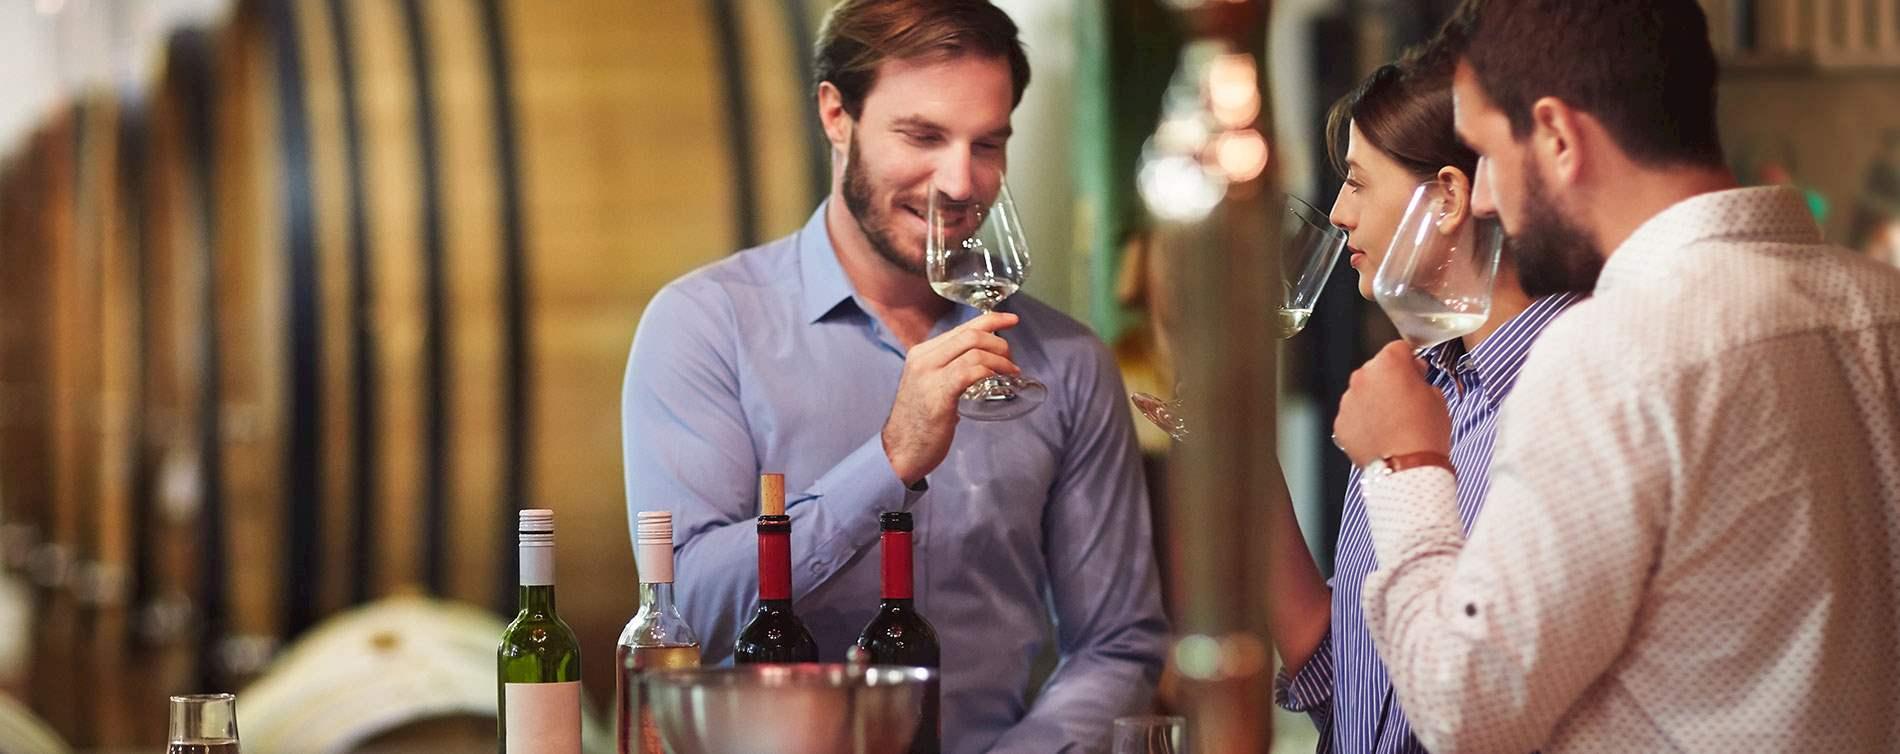 BEST WESTERN Sonoma Valley Inn & Krug Event Center, California Wineries